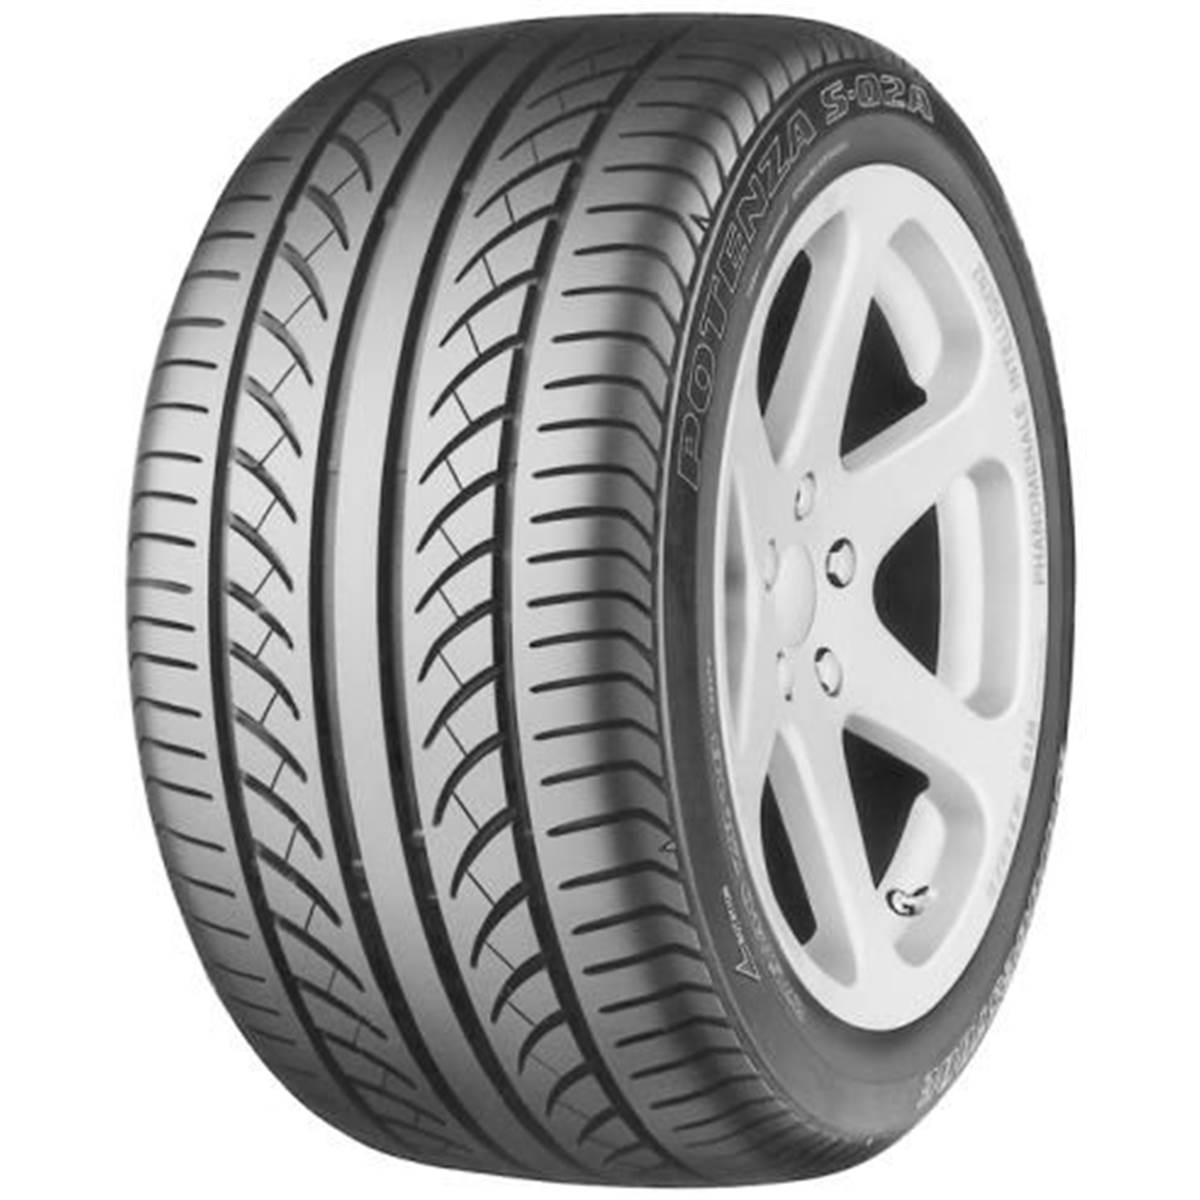 Pneu Bridgestone 295/30R18 Z Potenza S02A XL